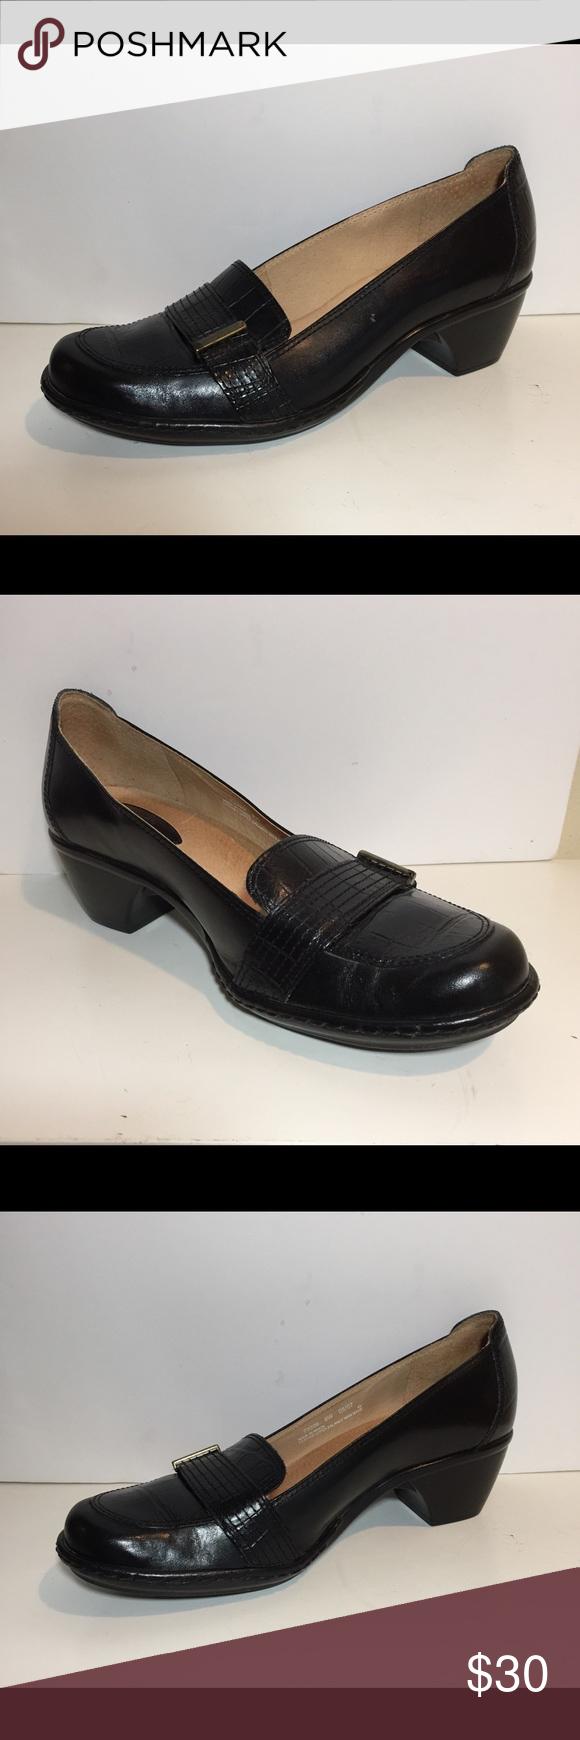 Clarks Artisan Women Shoes Black Leather Sz 8 M Clarks Artisan Collection  Women's Loafers Slip On Heel Wedges Black Leather Size 8 M Heel Height 2